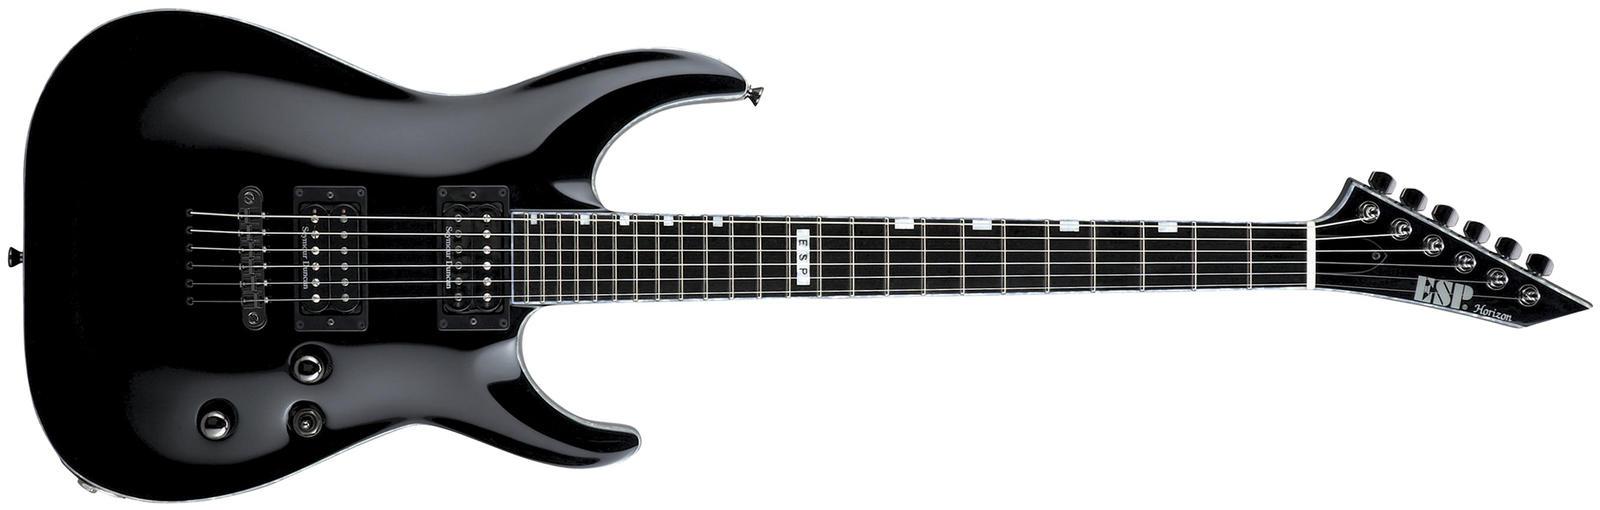 meilleur marque de guitare